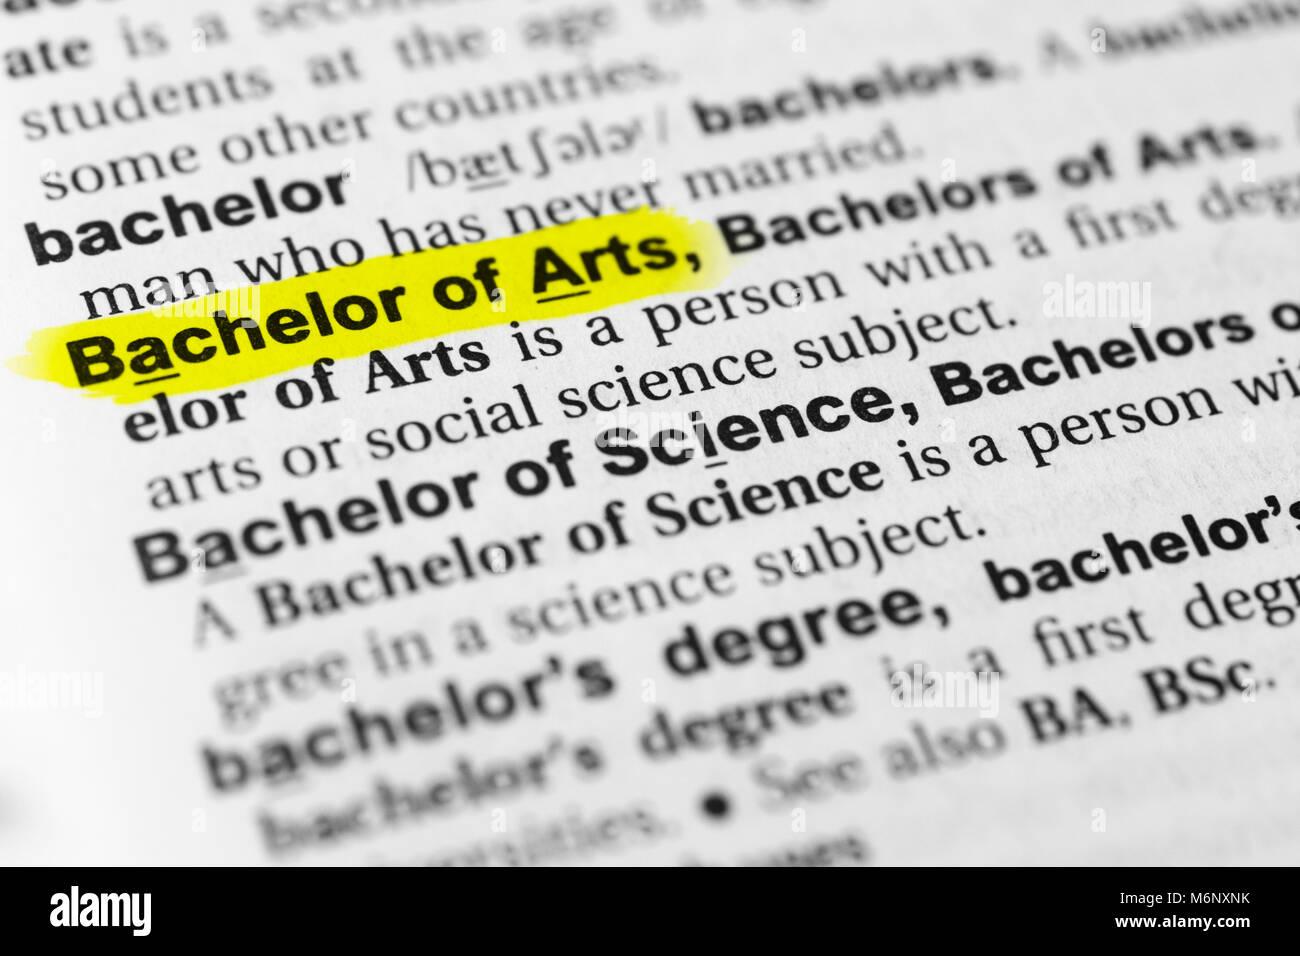 bachelor of arts stock photos & bachelor of arts stock images - alamy